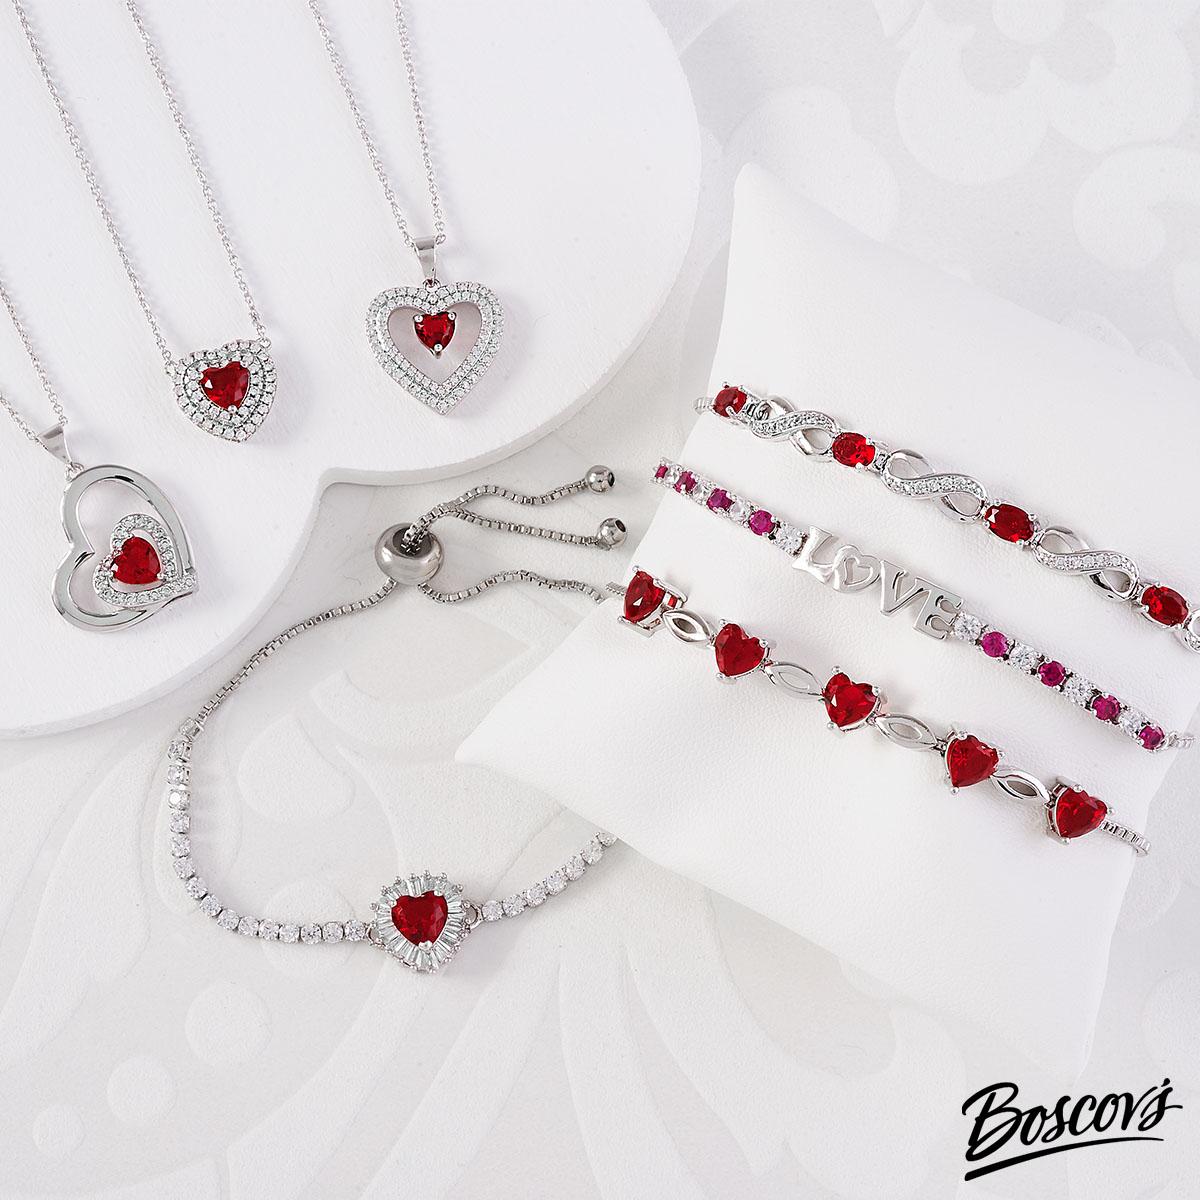 Boscovs ruby and diamond valentine's jewelry